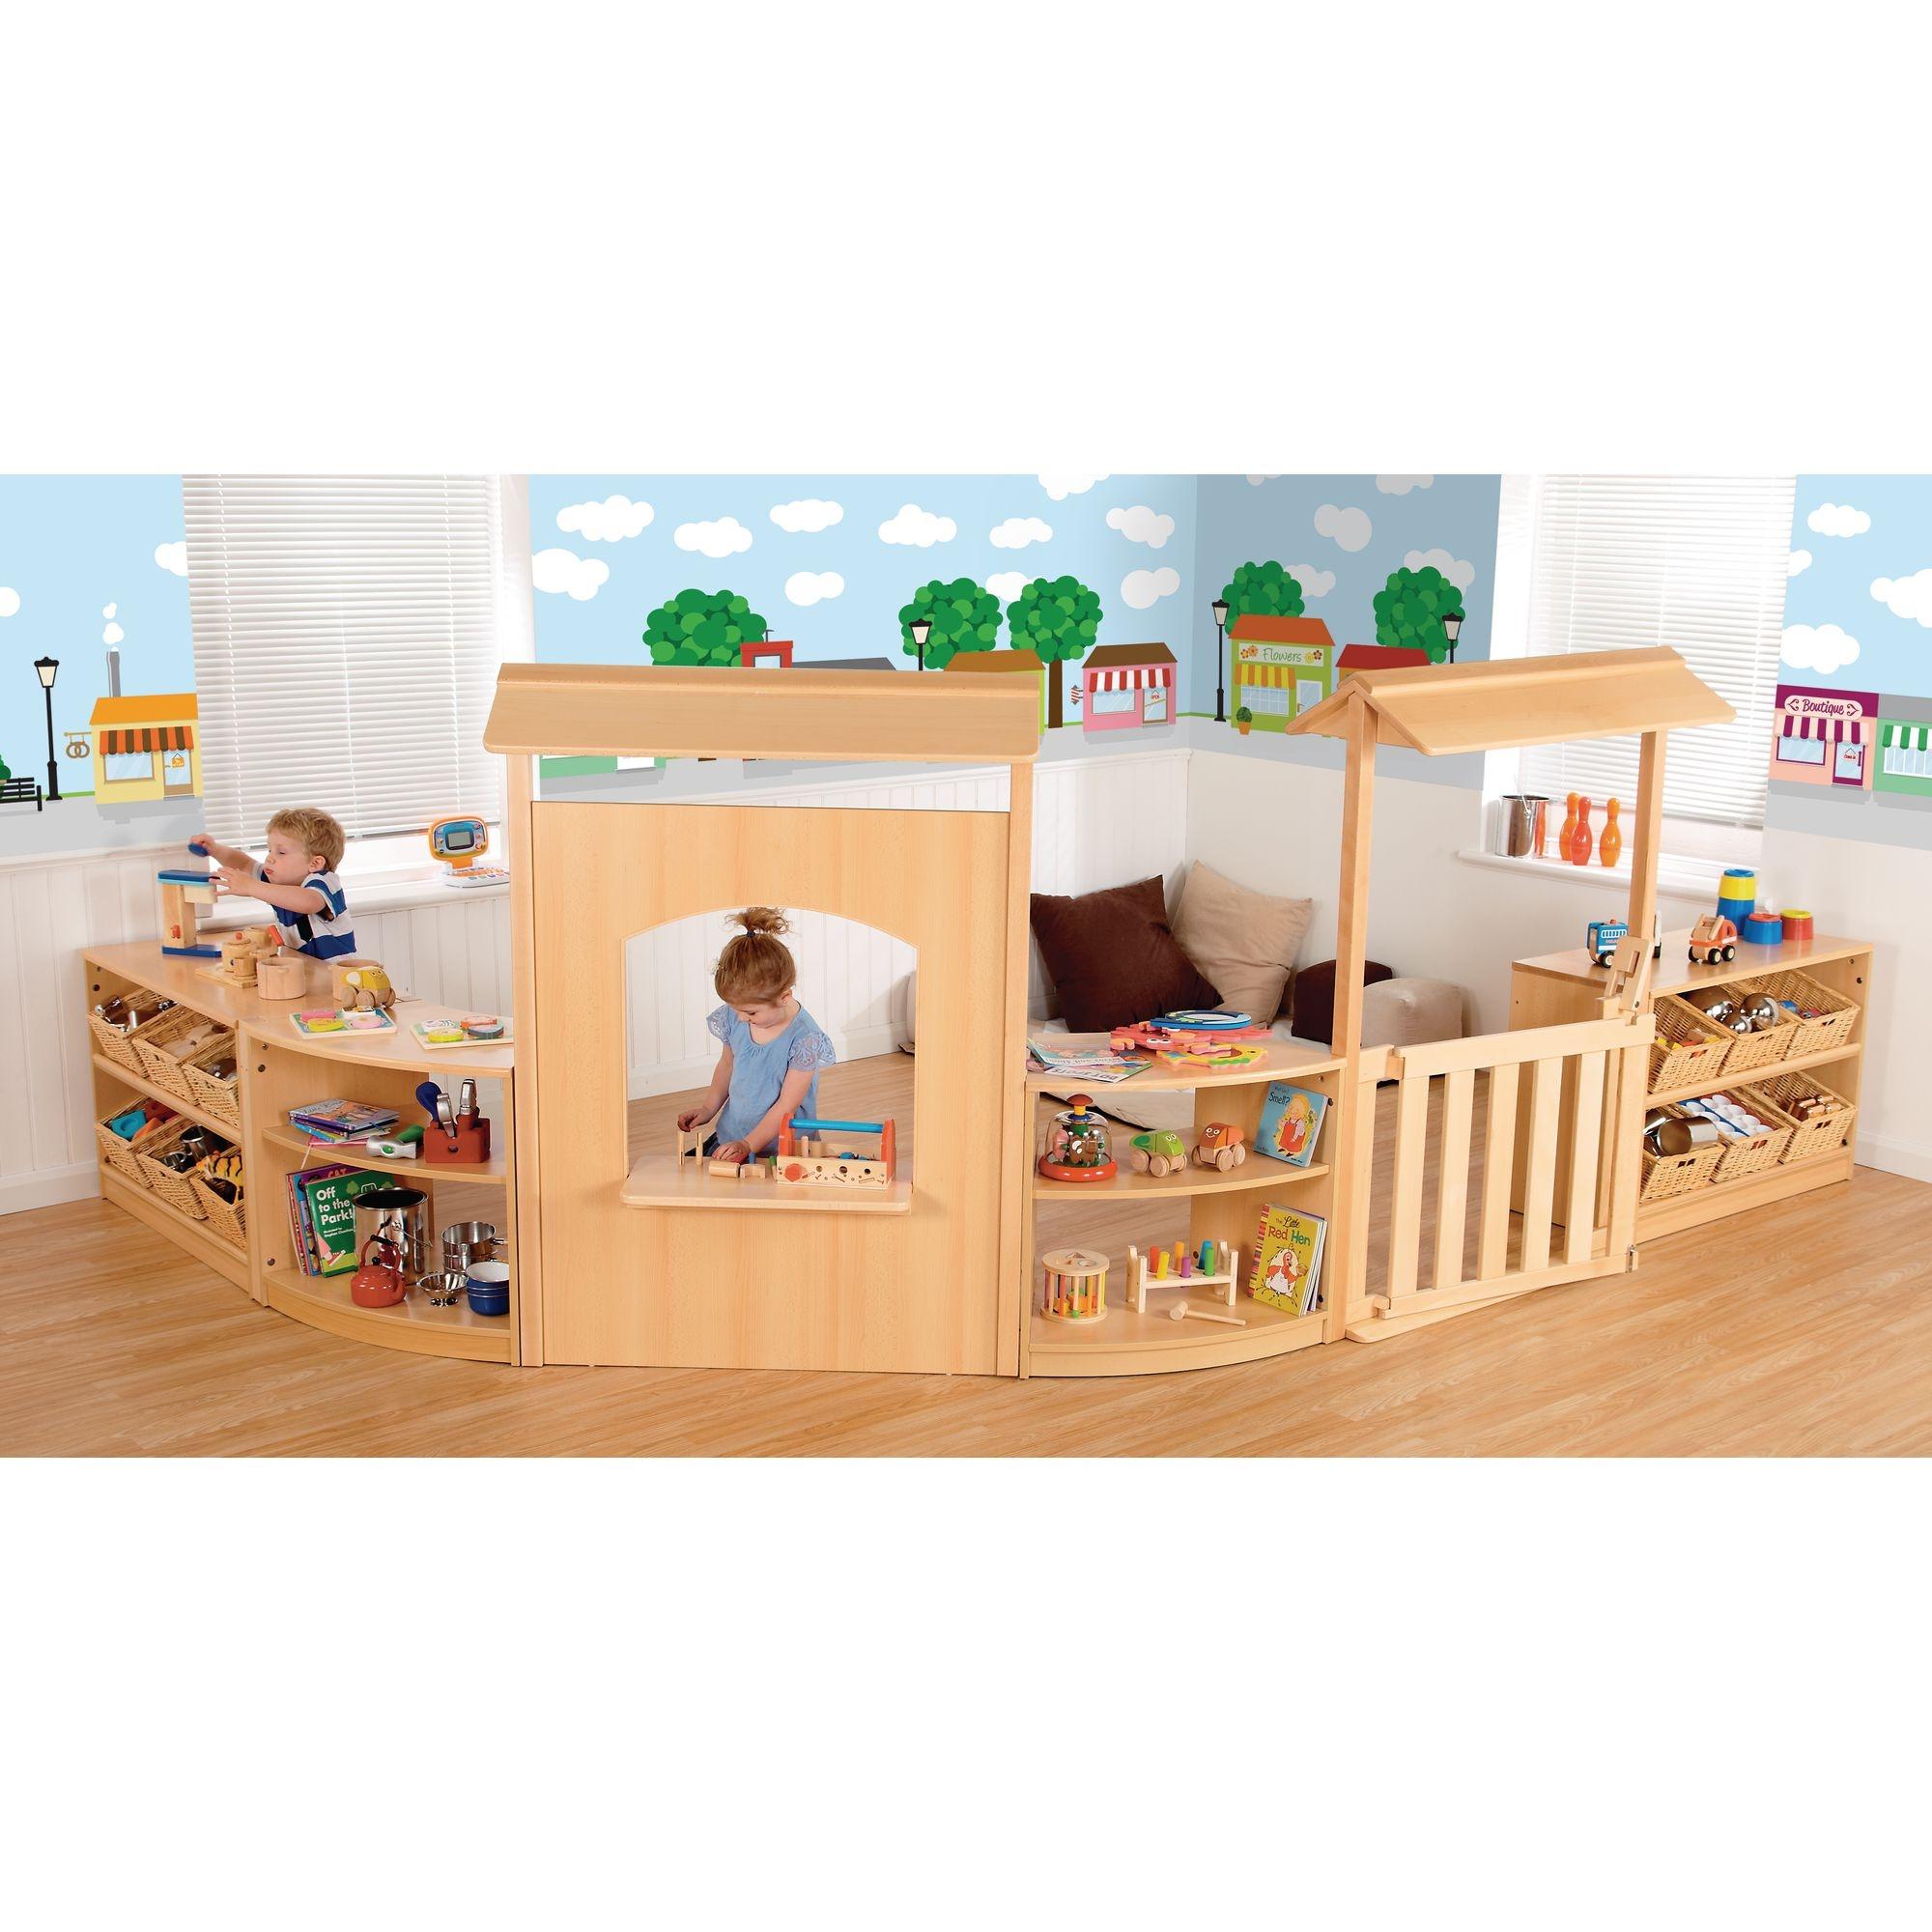 Classroom Set 8